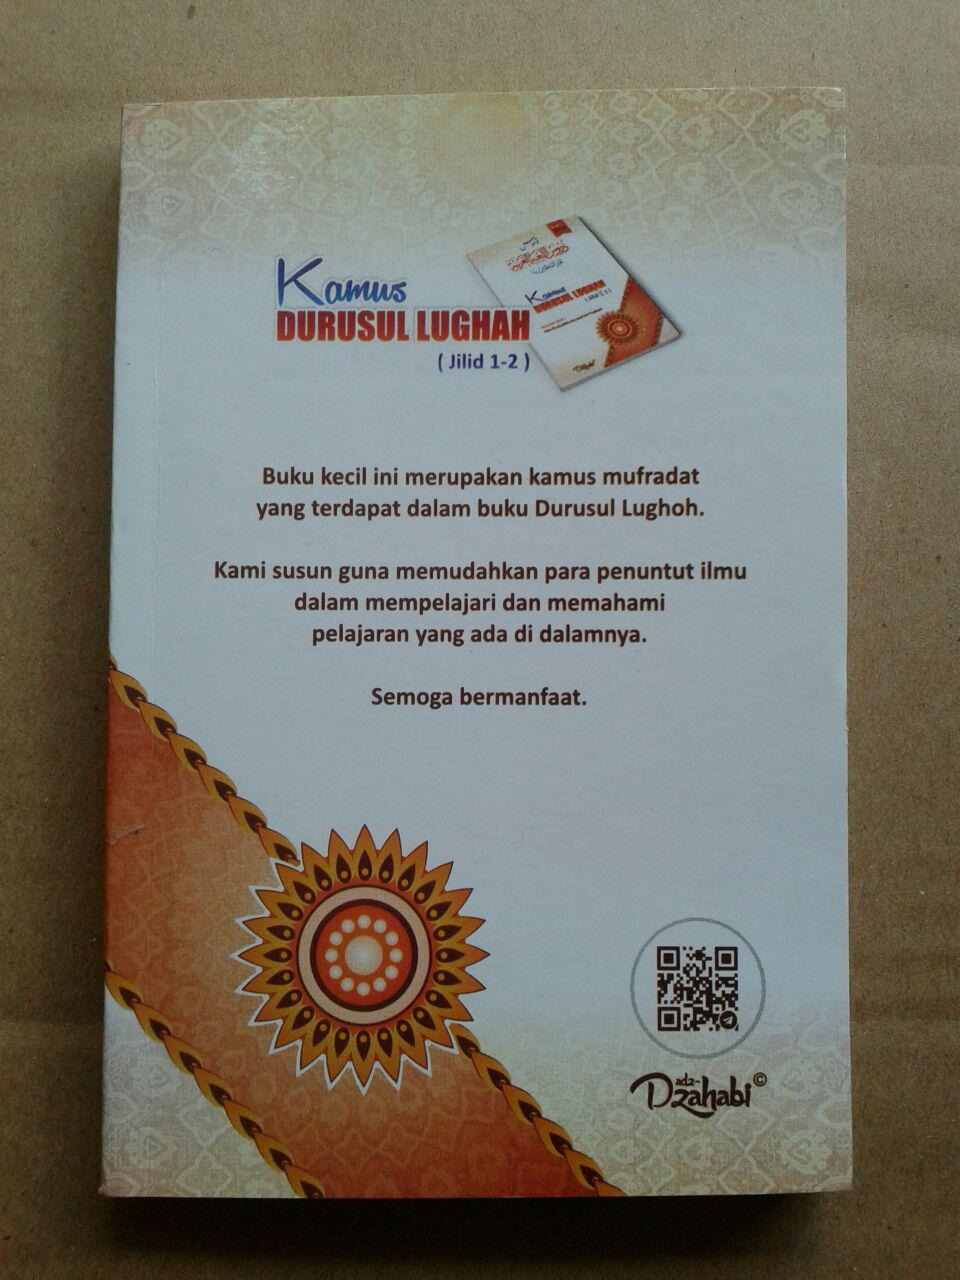 Buku Kamus Durusul Lughah cover